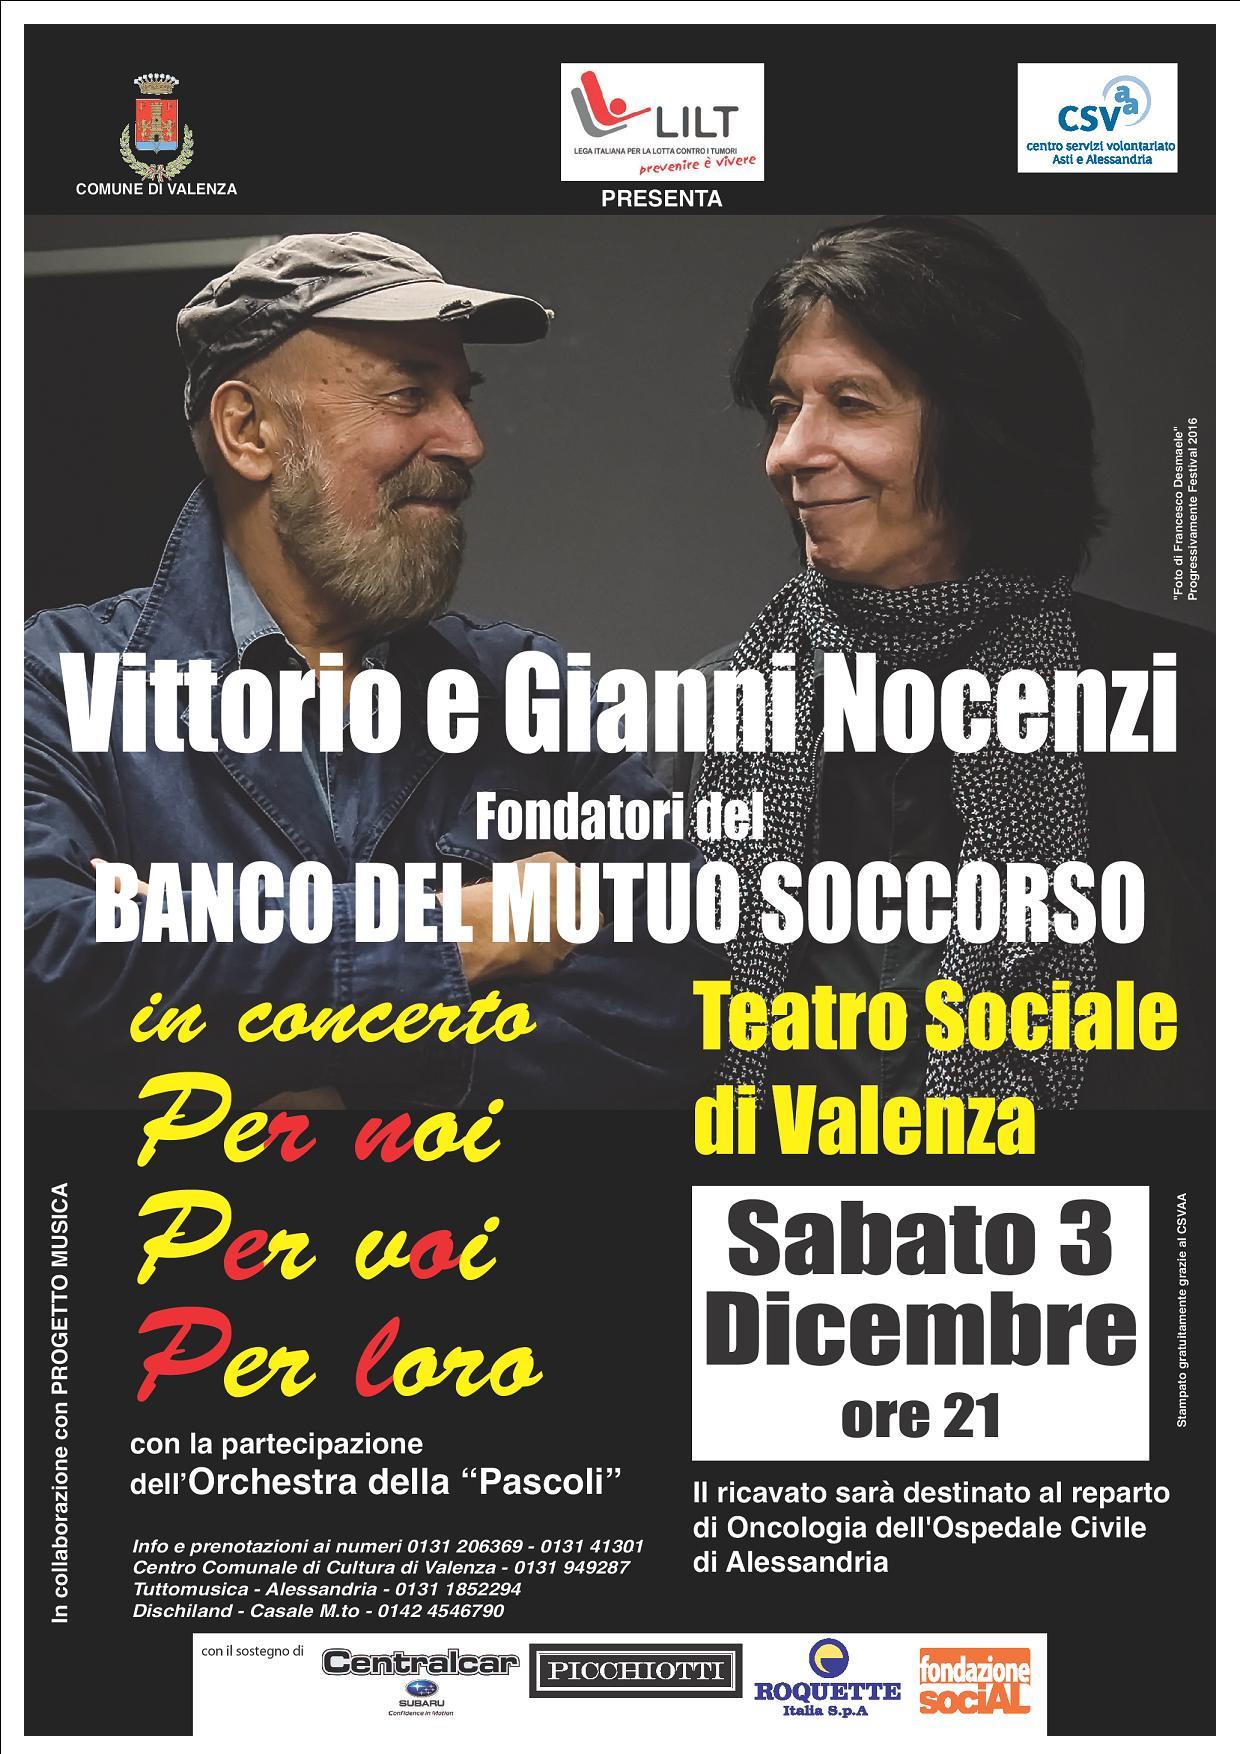 films sesso lovepedia italia